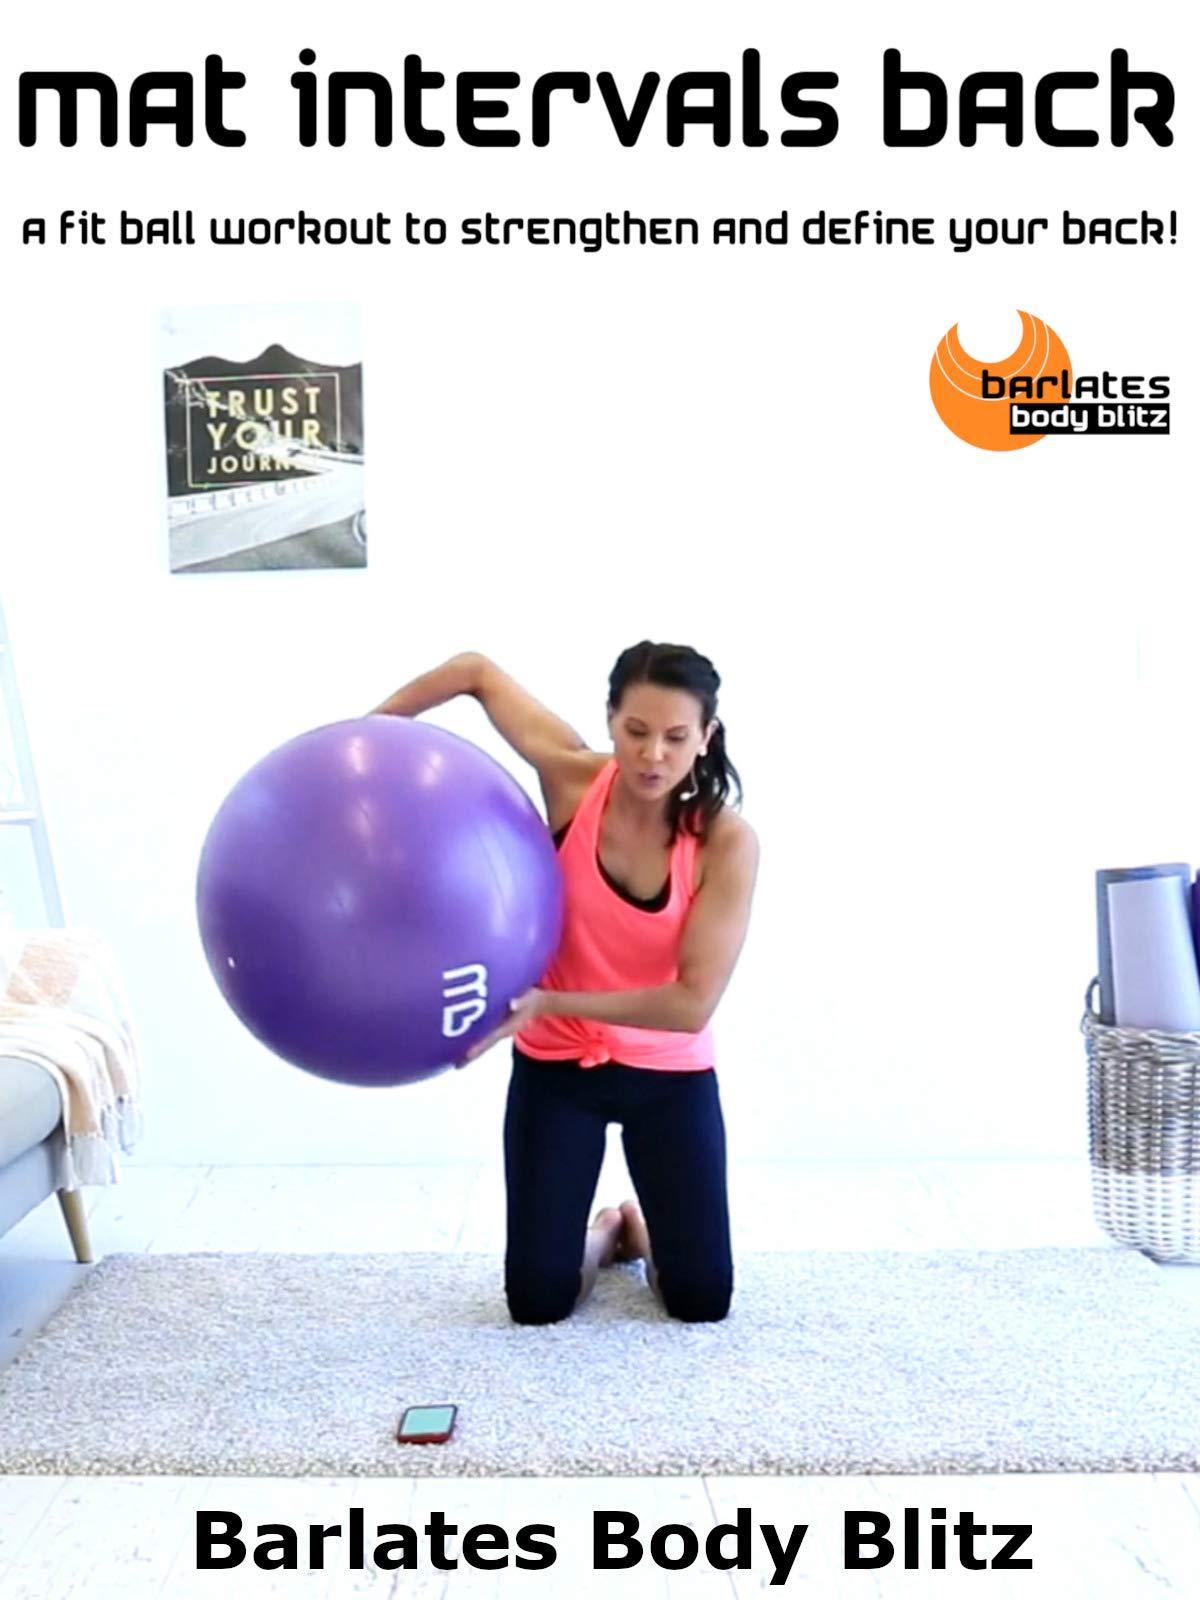 Barlates Body Blitz Mat Intervals Back on Amazon Prime Instant Video UK